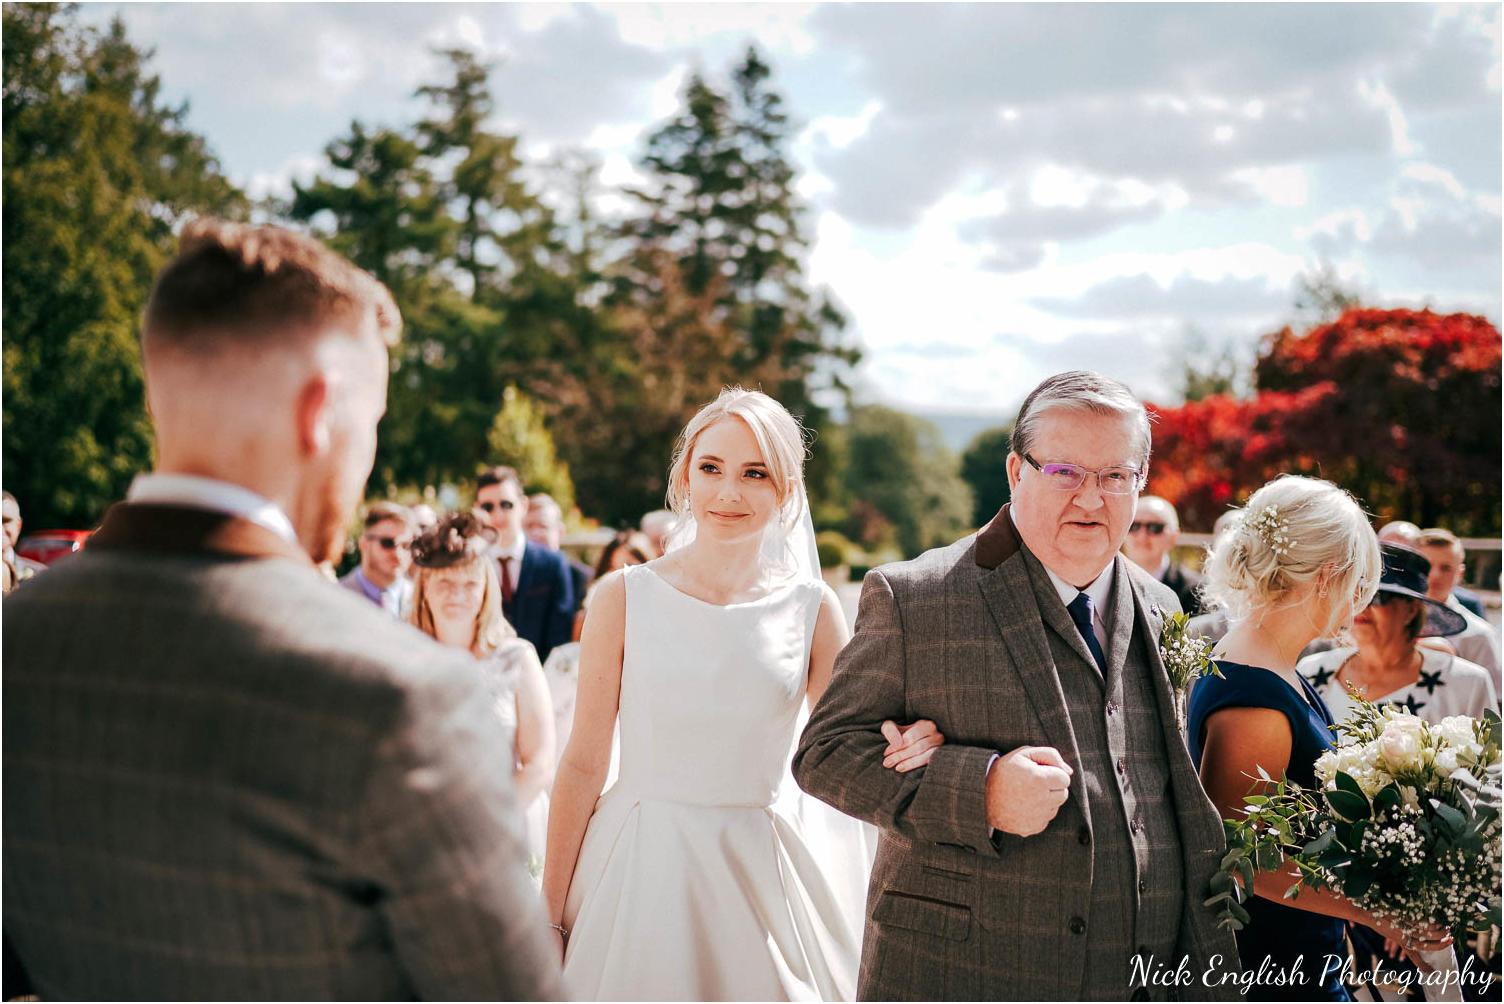 Eaves_Hall_Outdoor_Wedding_Photograph-32.jpg